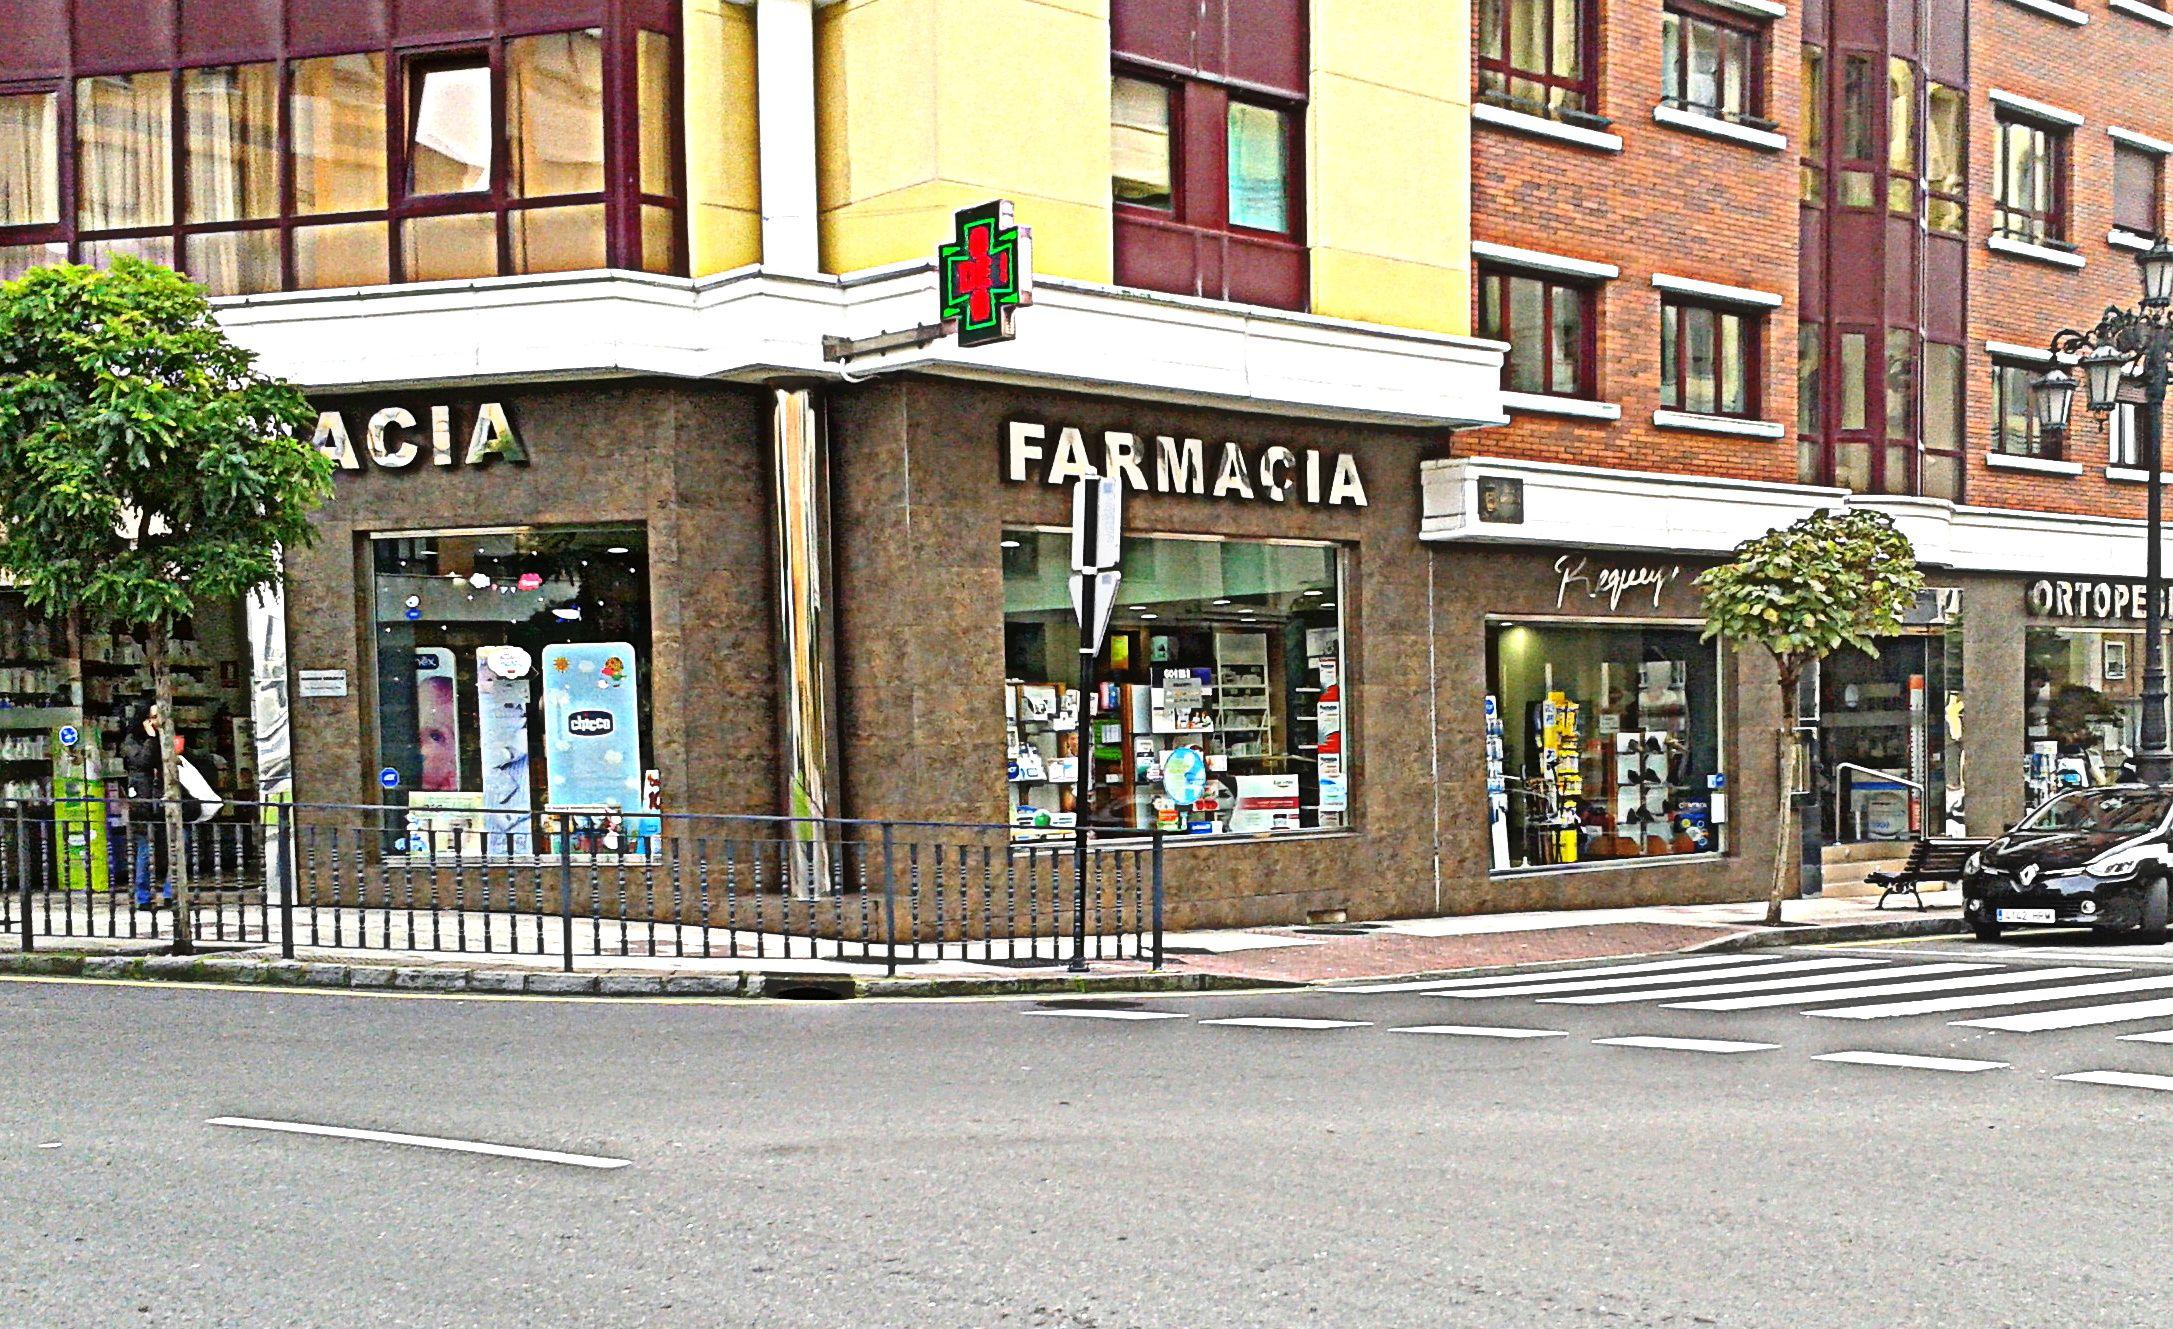 Farmacia Ortopedia Requeijo Street Street View Views